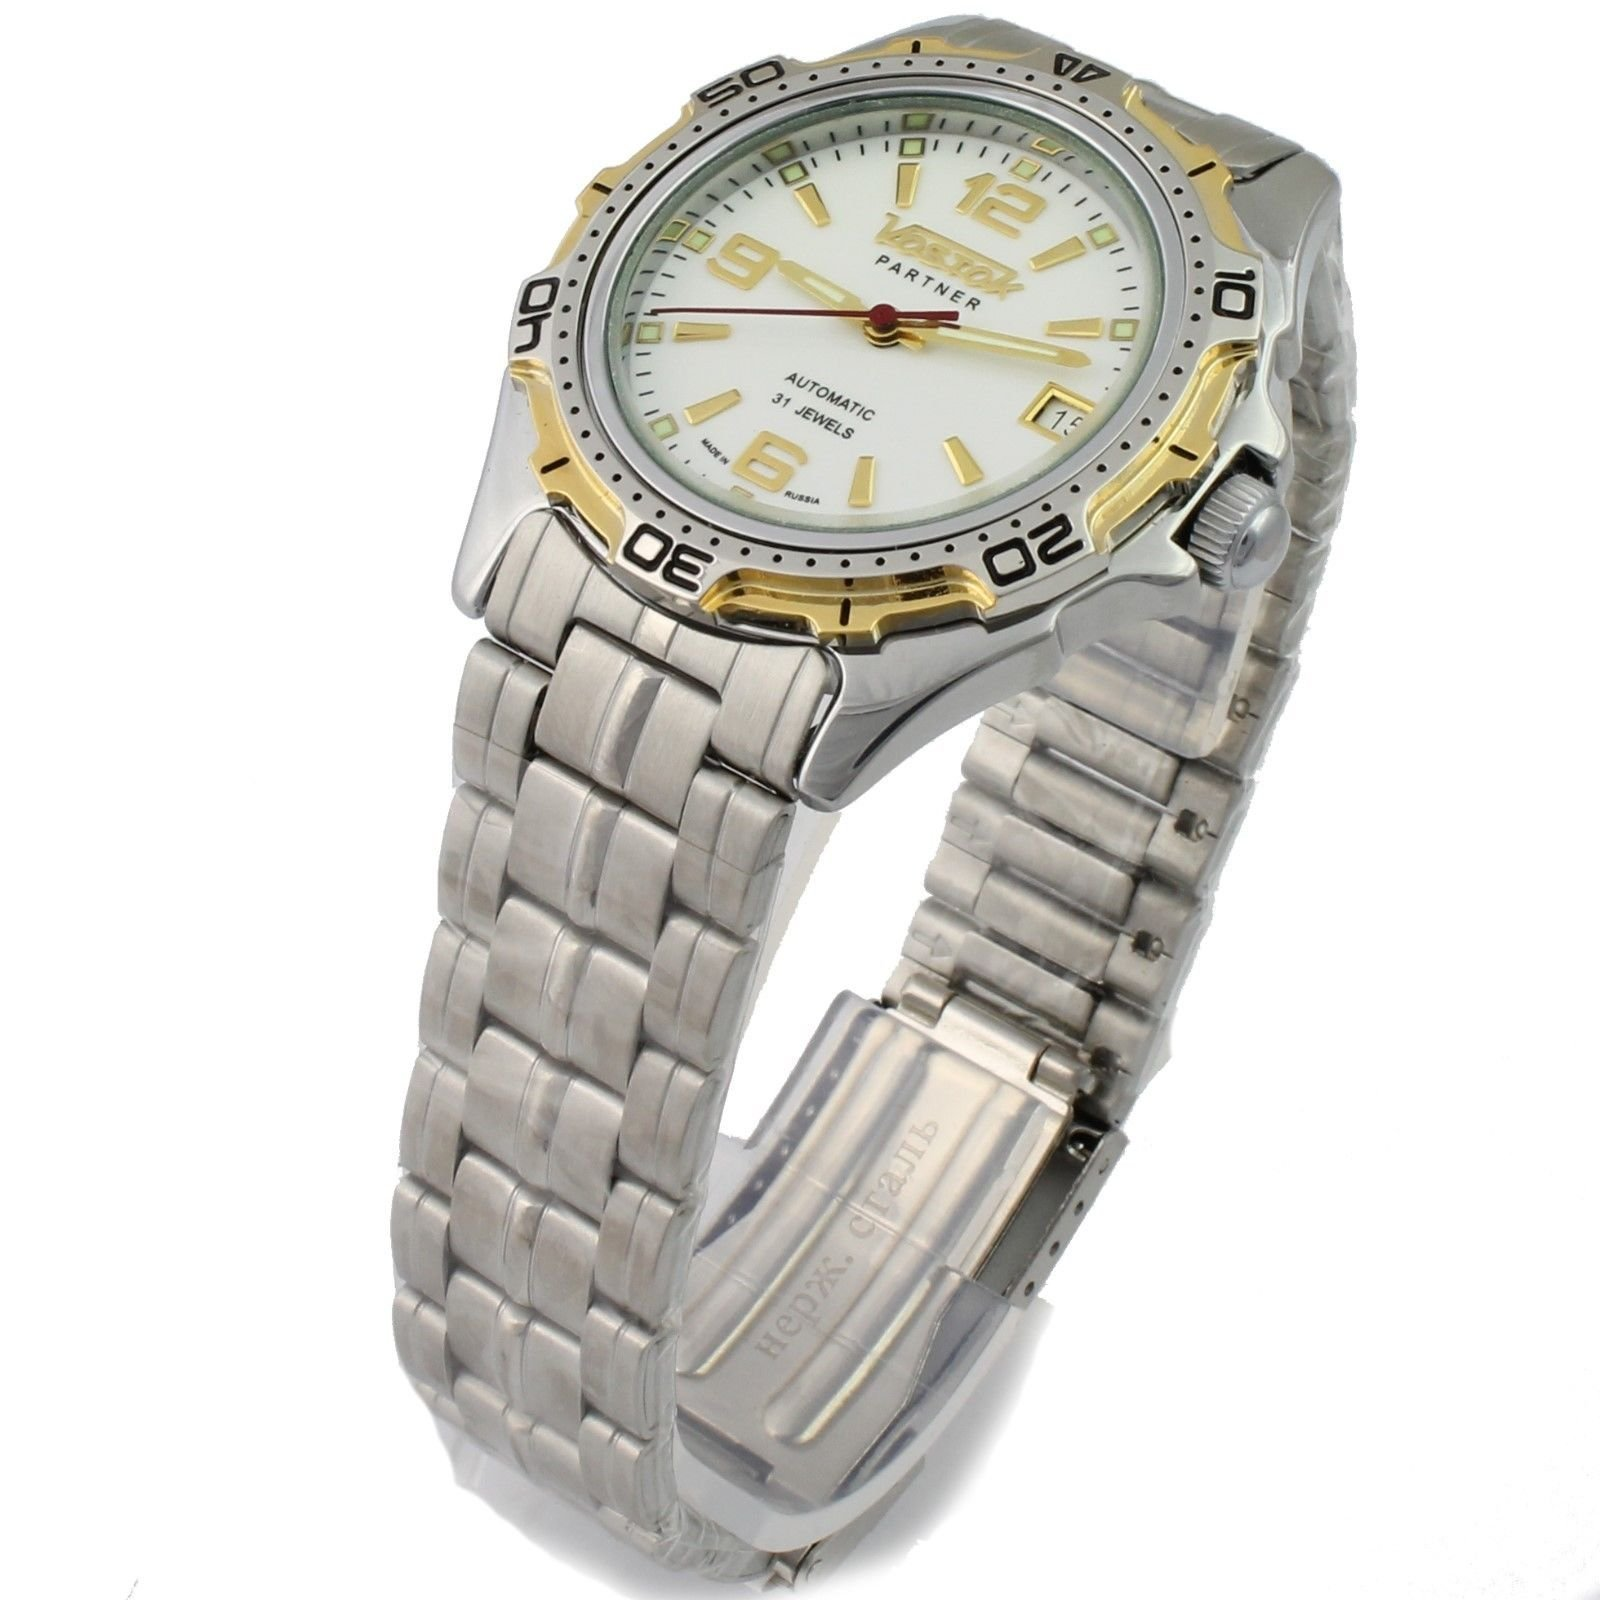 Vostok Partner 301732/2416b Mechanical Auto Wrist Watch Shockproof Waterproof...